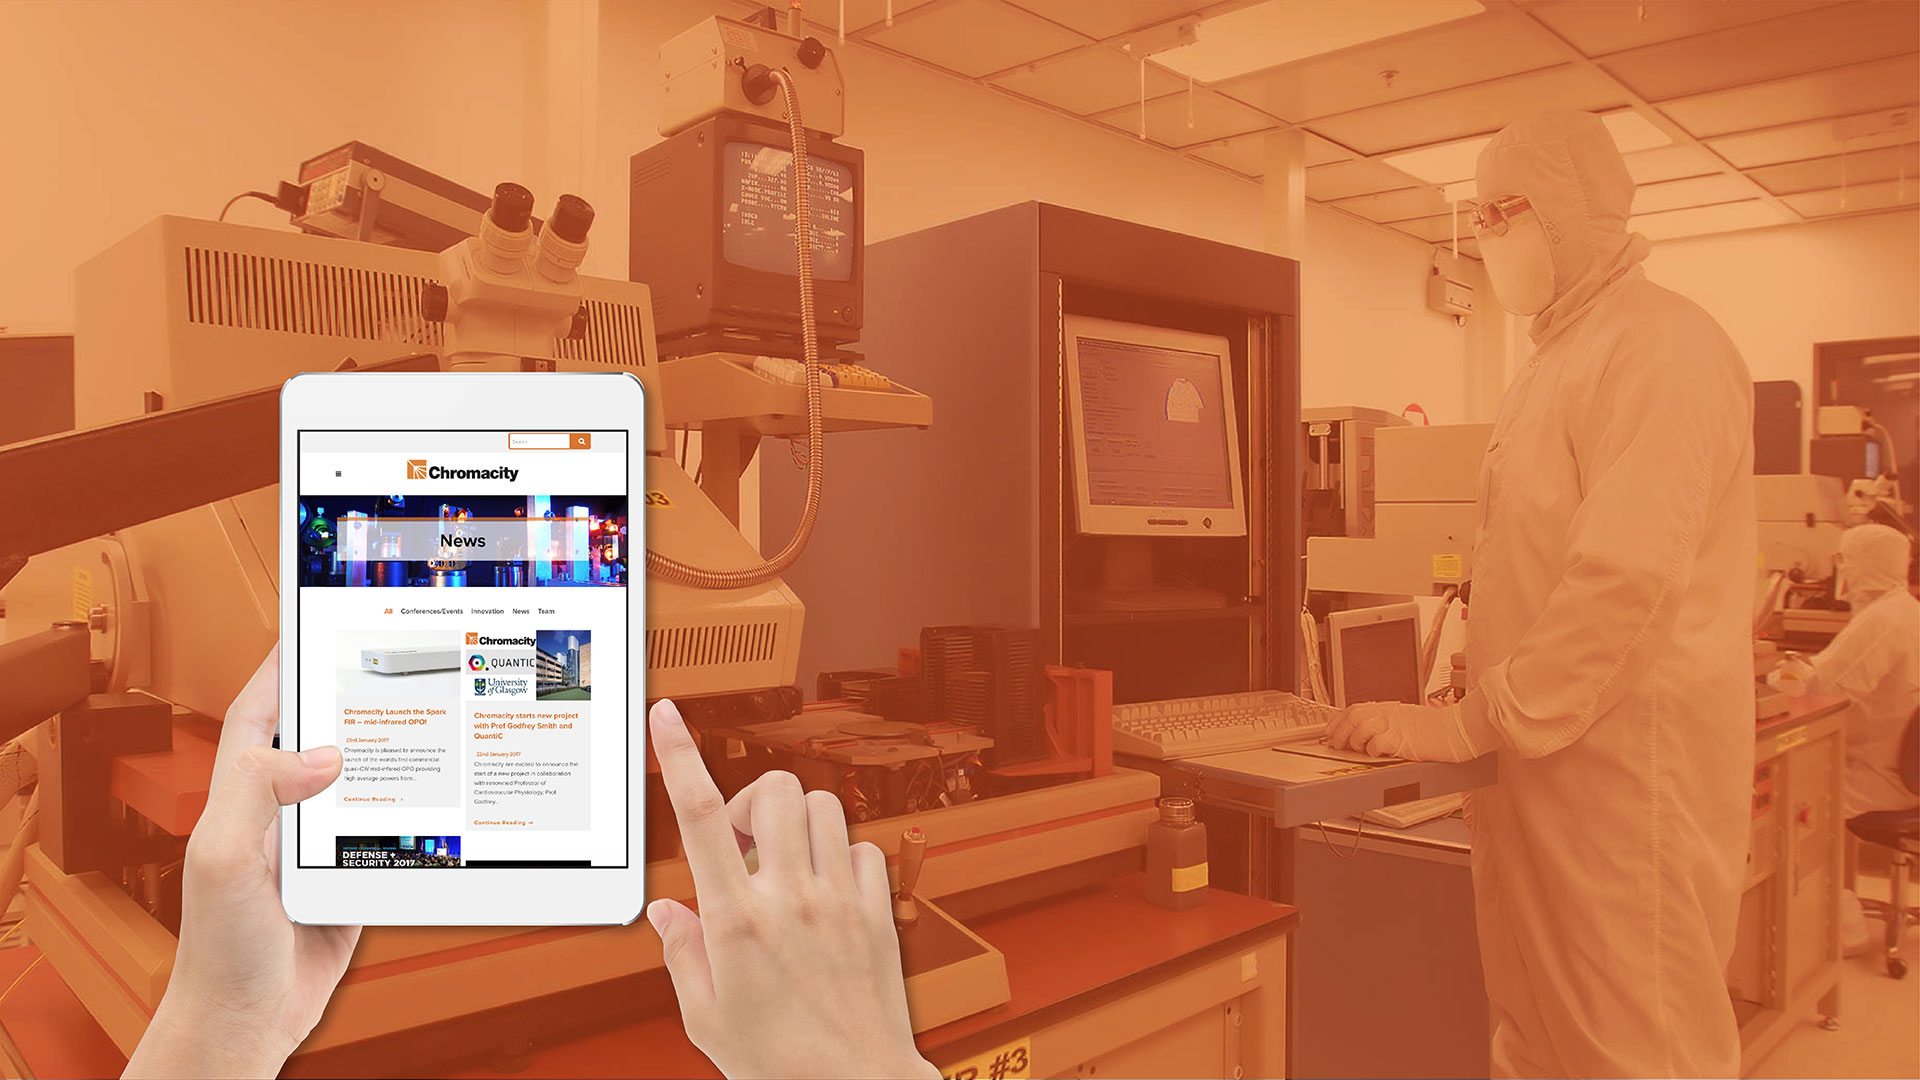 iPad displaying Chromacity website against backdrop of laser laboratory